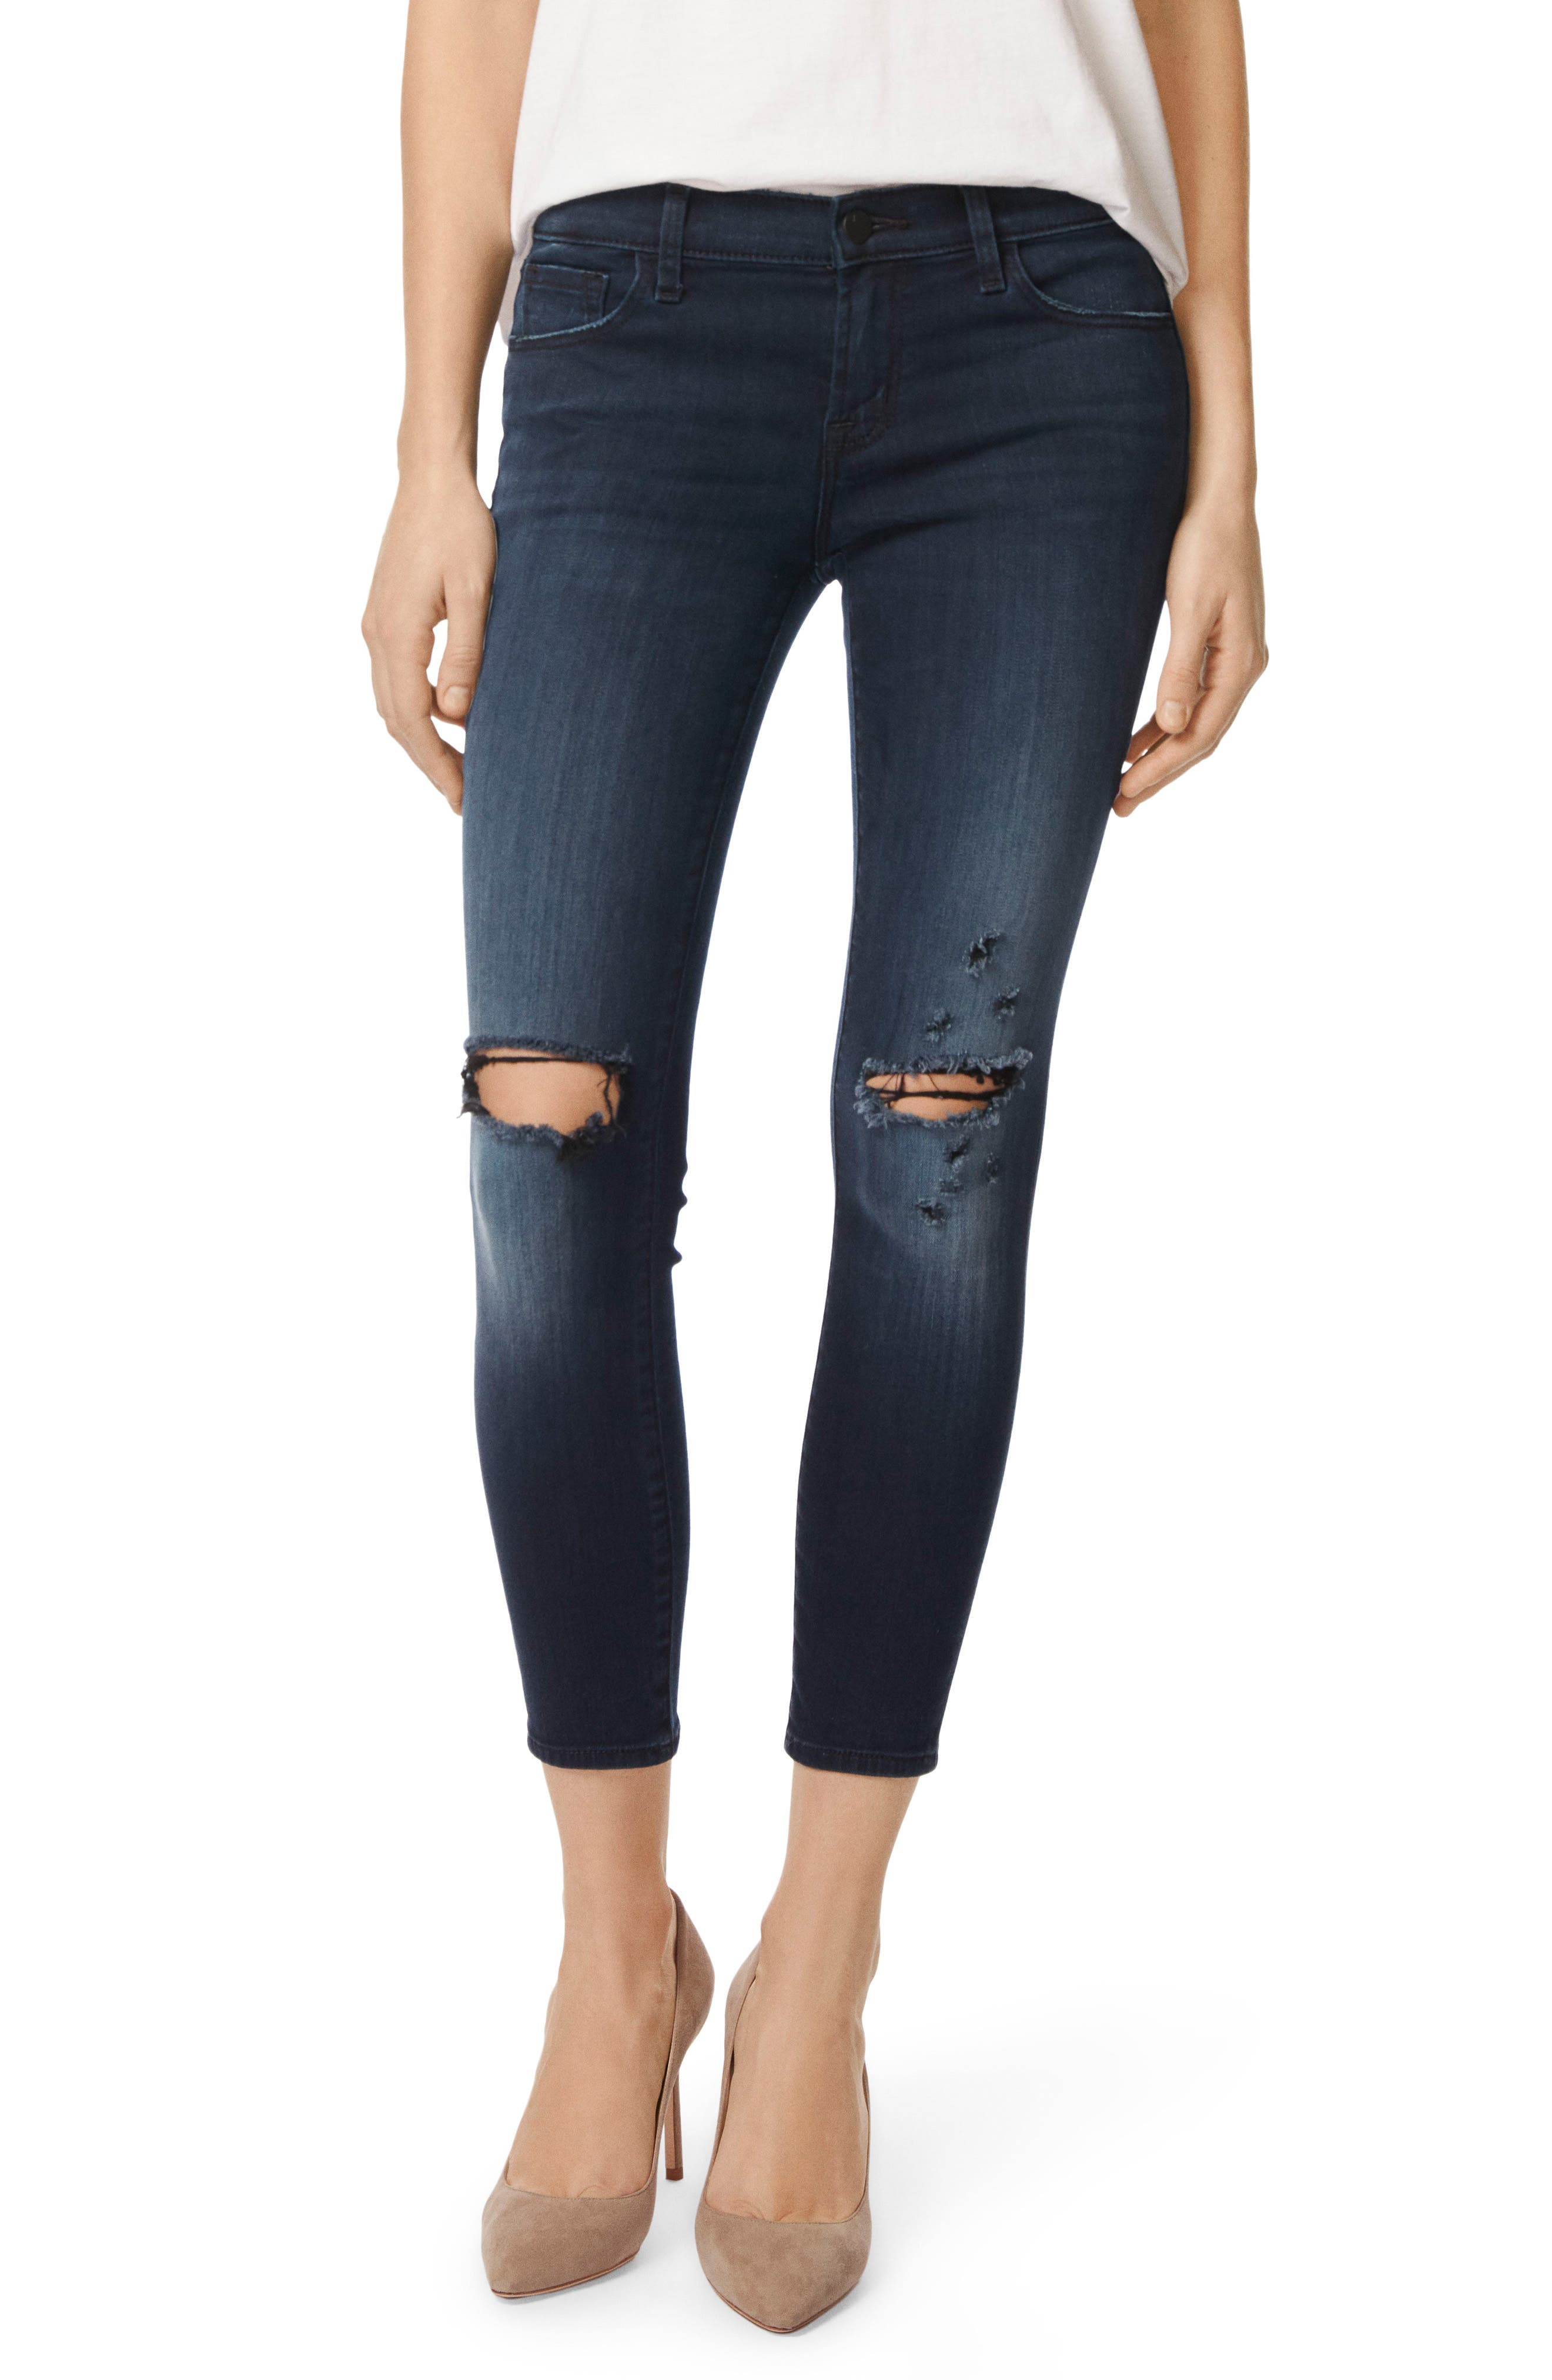 9326 Low Rise Crop Skinny Jeans,                         Main,                         color, Black Sea